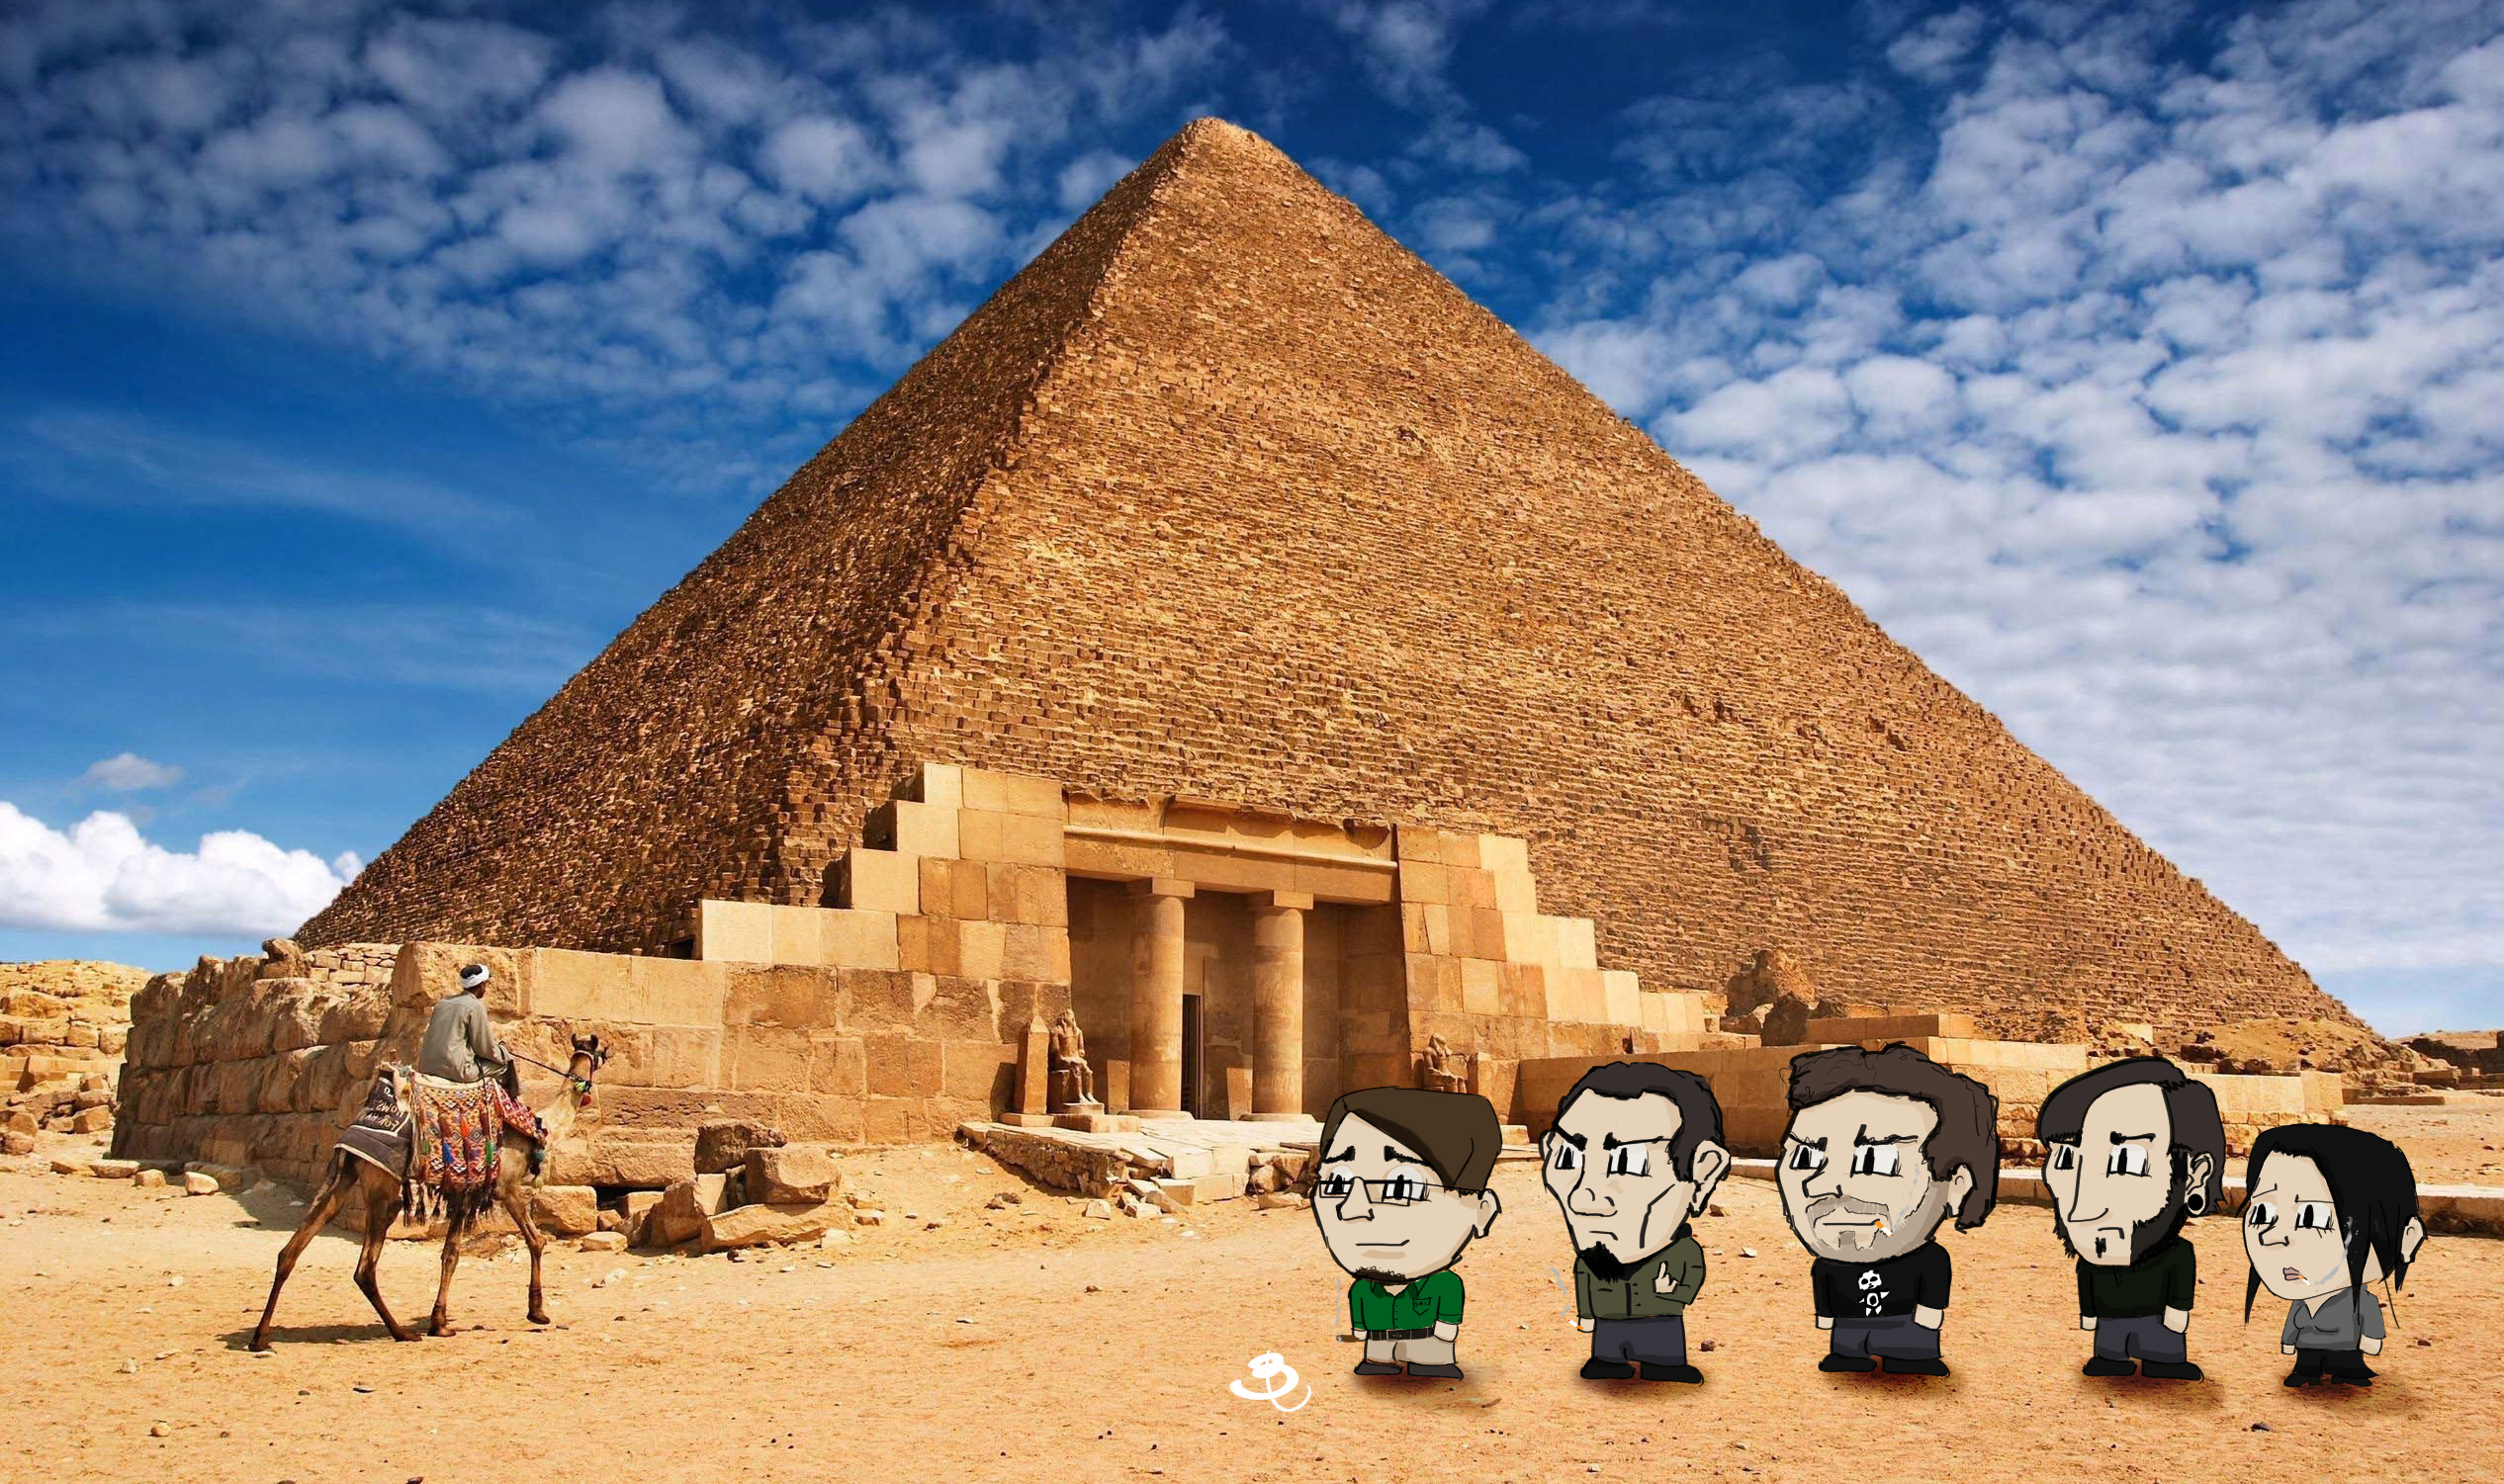 House members in Egypt